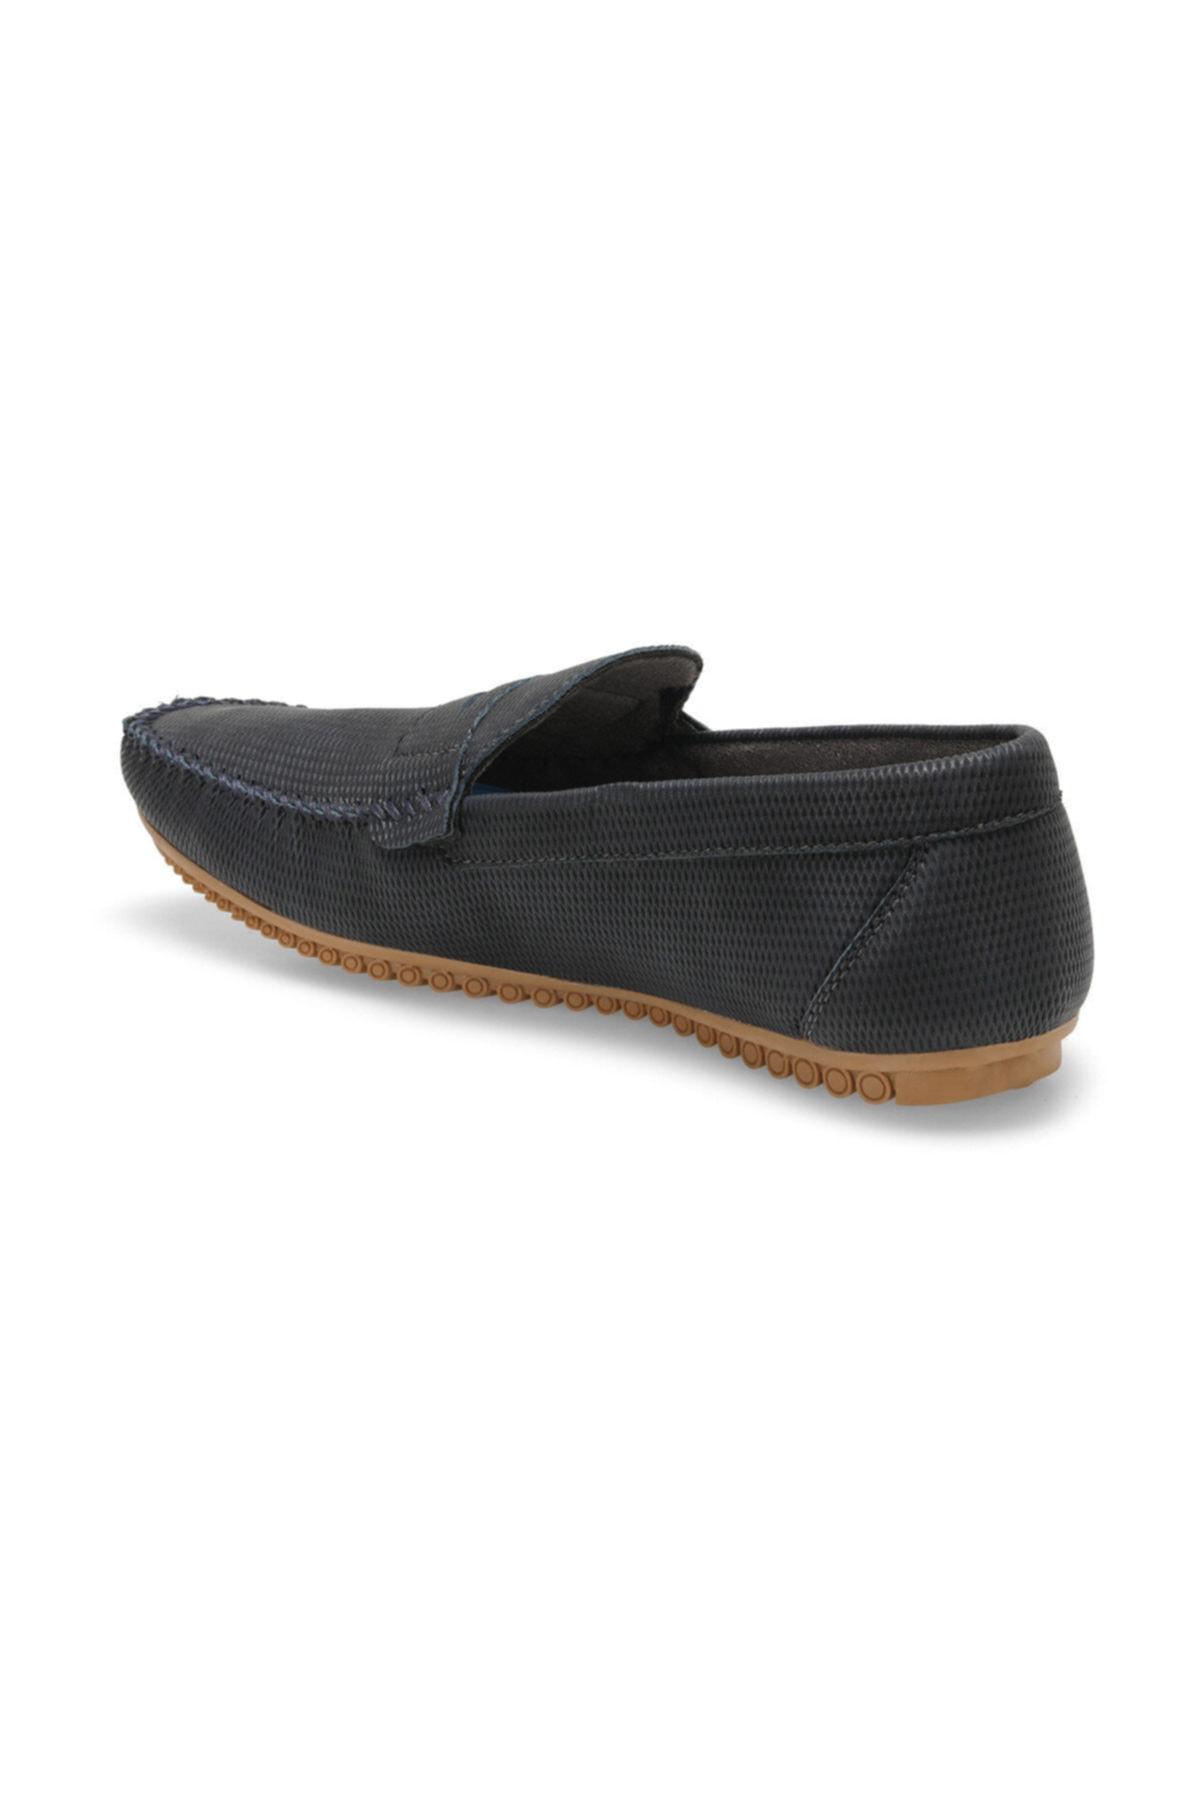 OXIDE MDL2 C Lacivert Erkek Loafer Ayakkabı 100349388 2